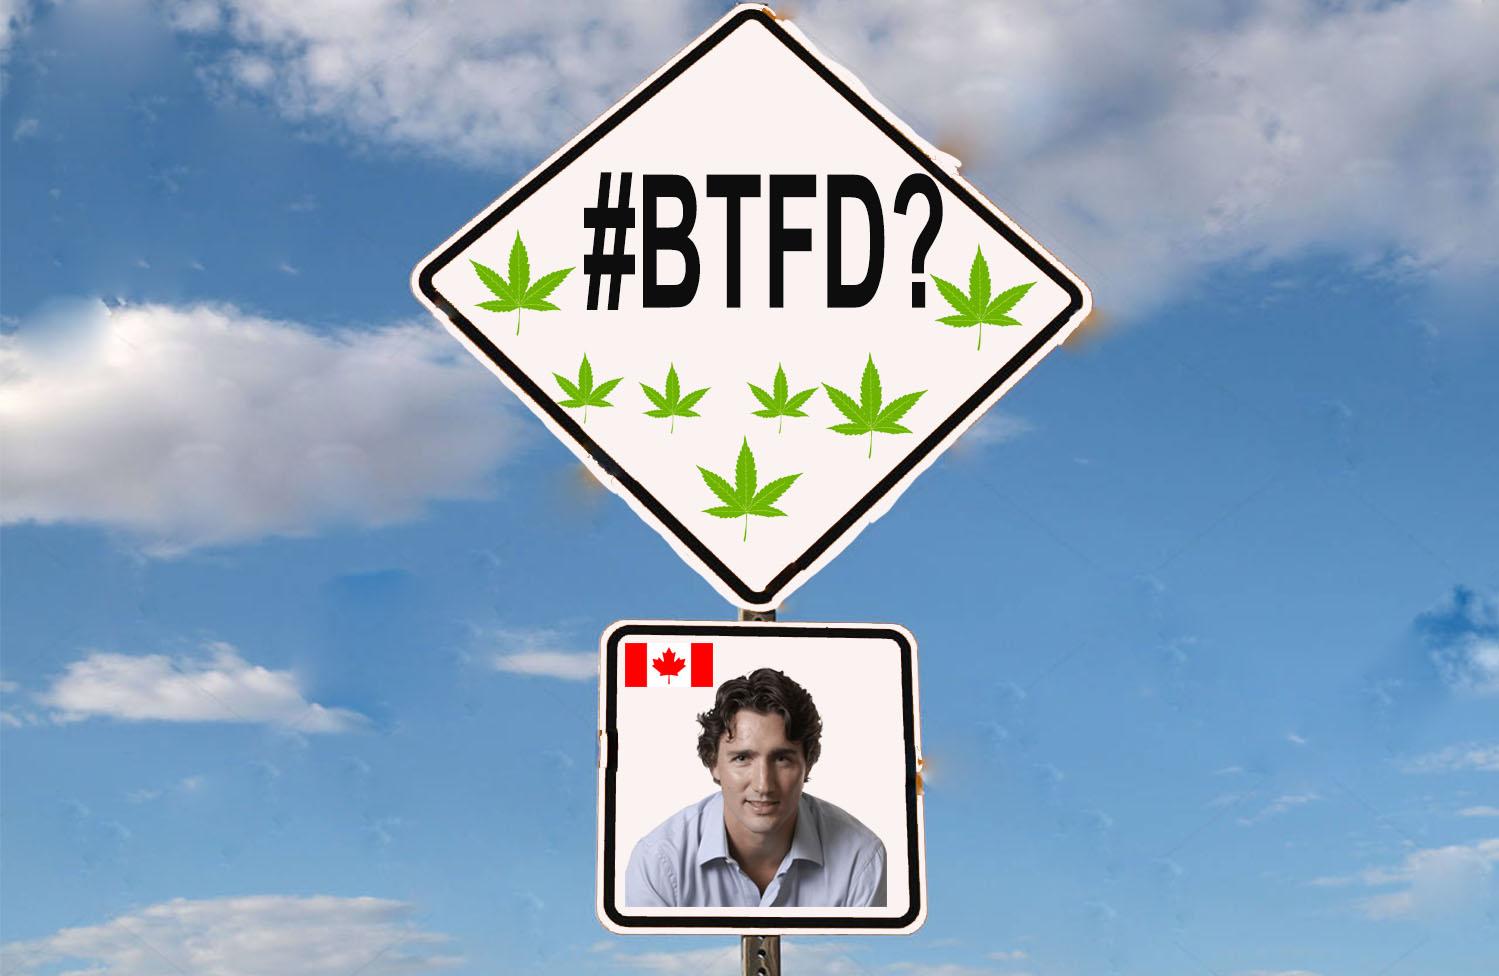 btfd_weed_canada